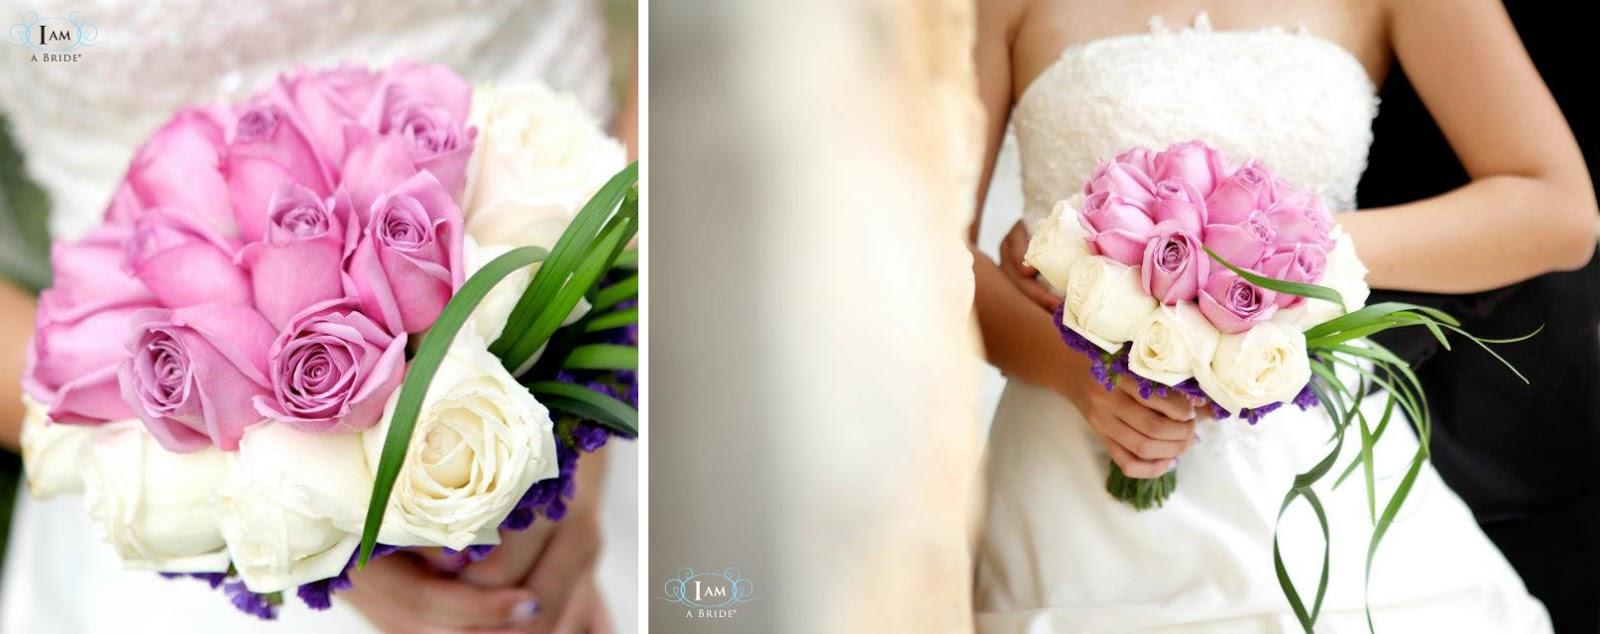 How To Preserve Wedding Dress 74 Best Our bride Beebee in